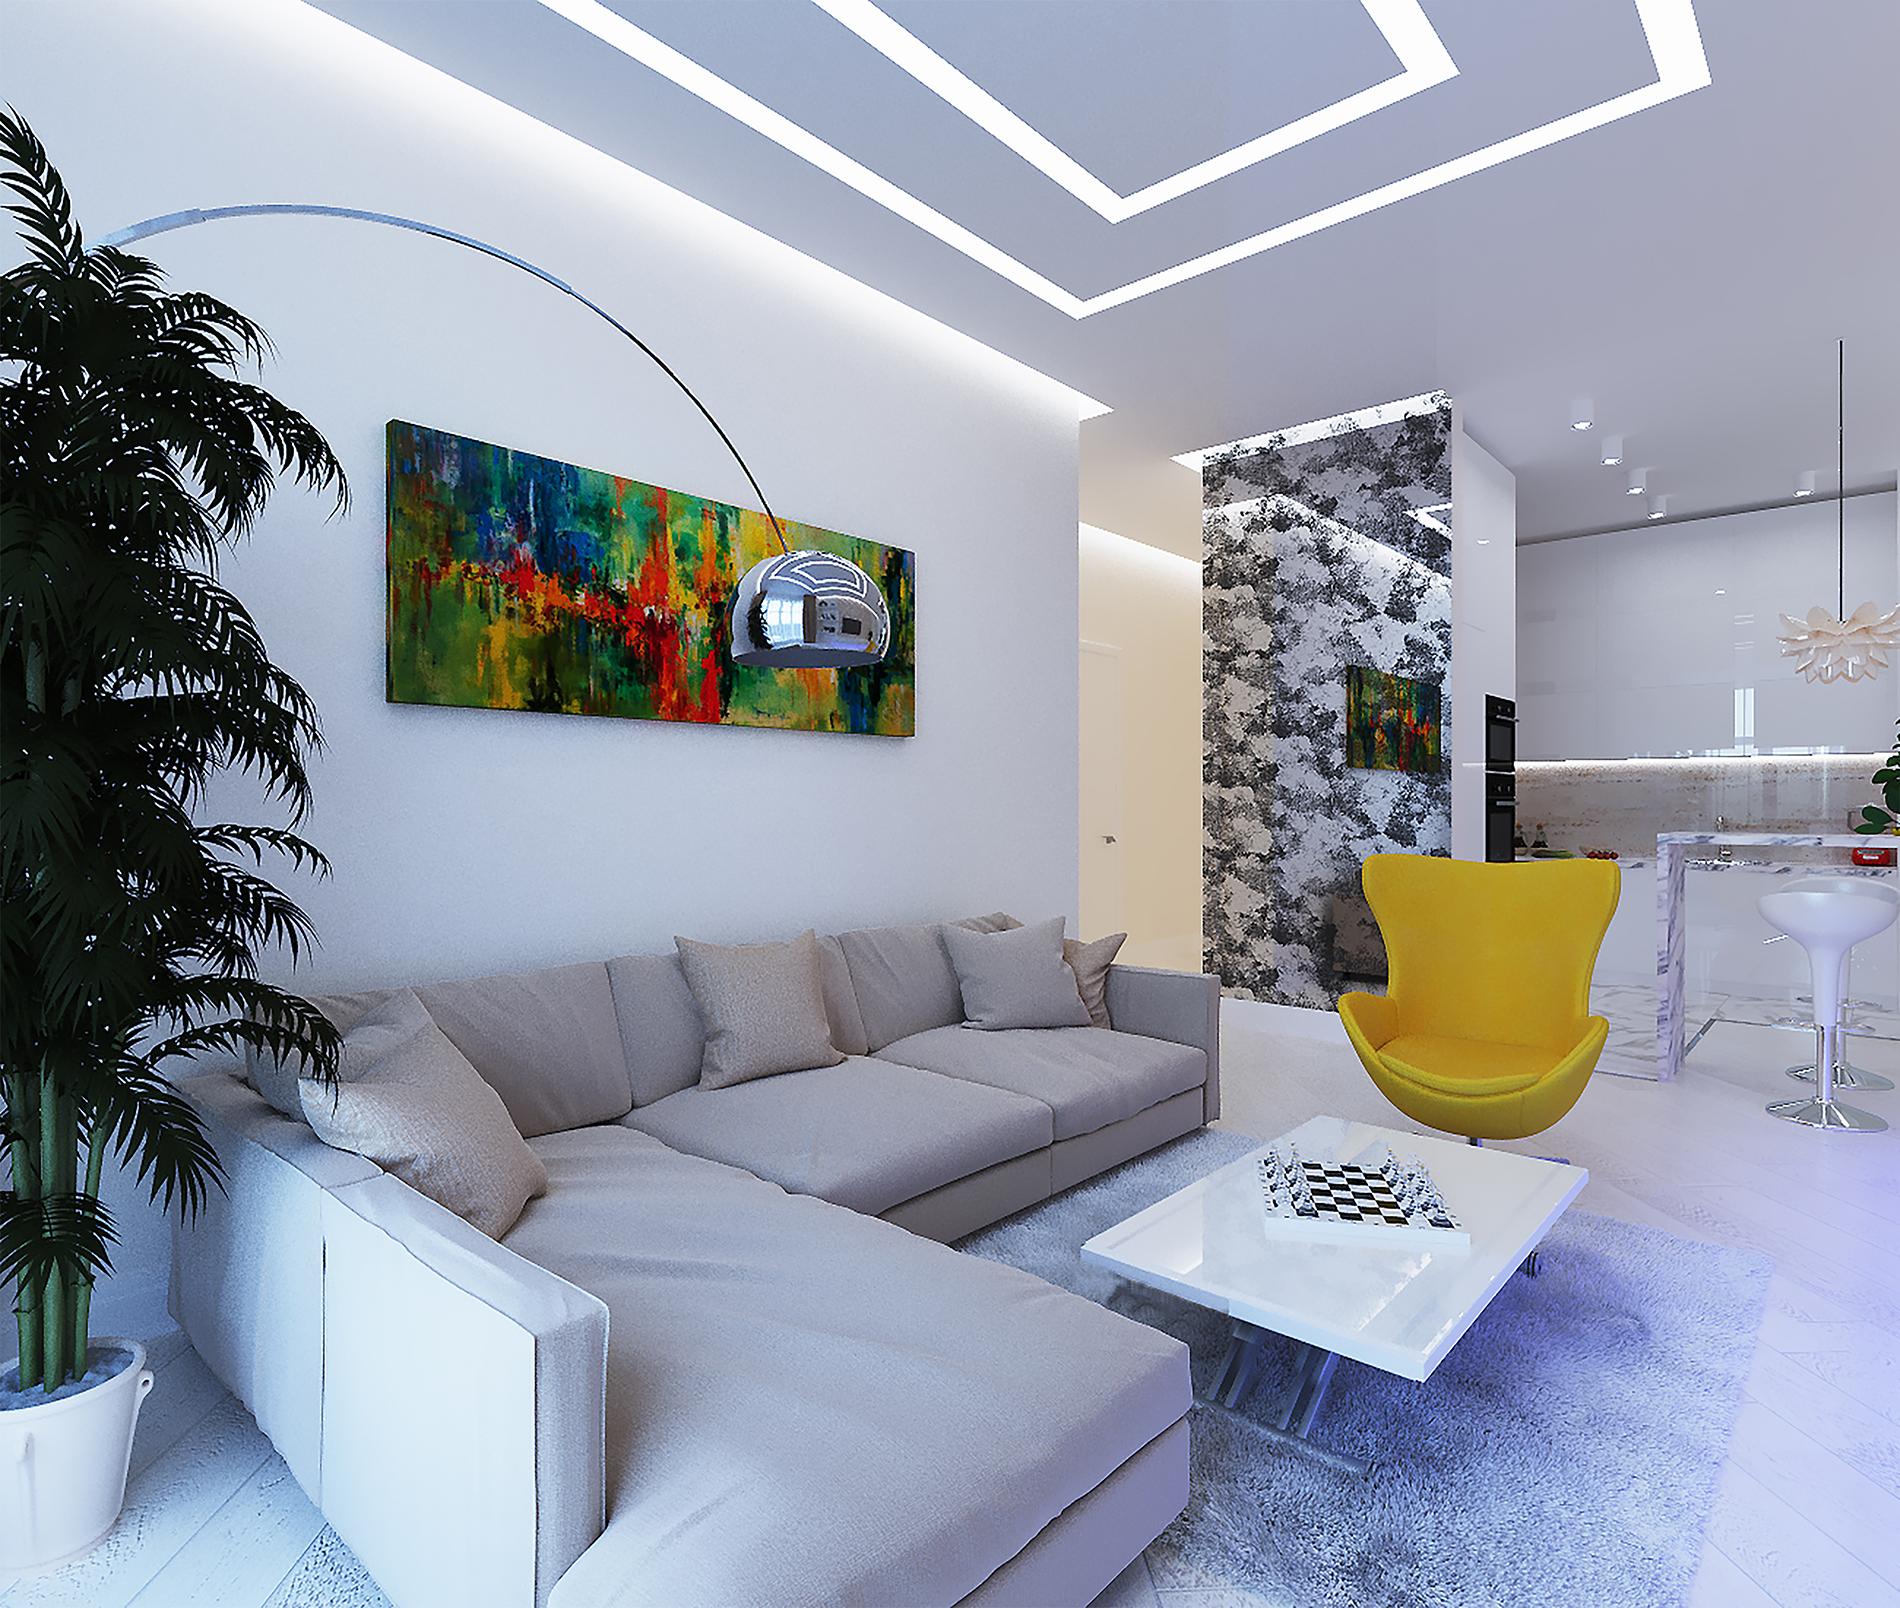 Flat in PecherSky Luxury Apartments (84m2)